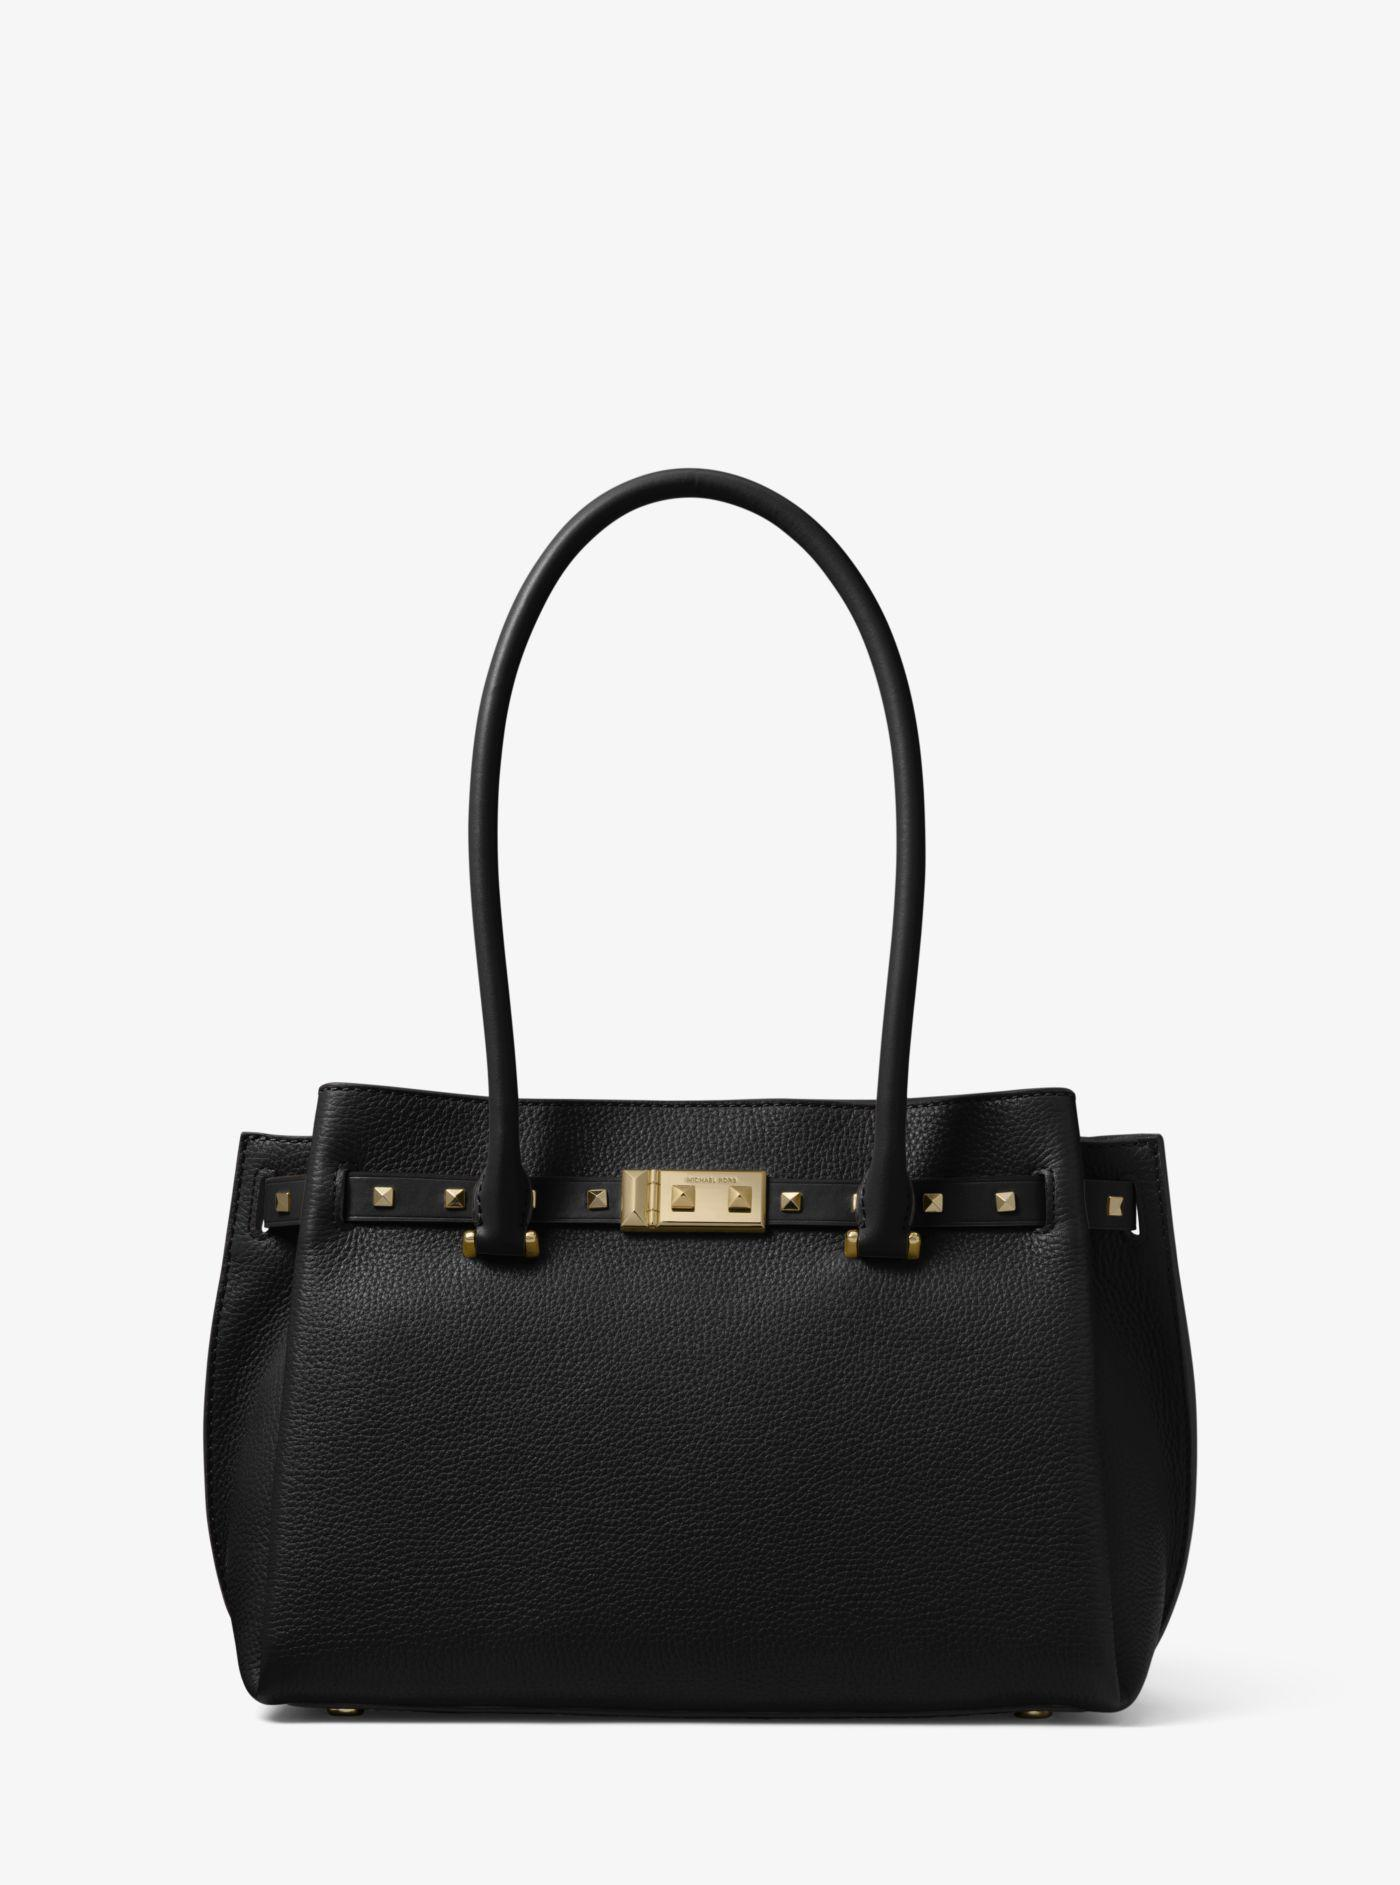 bfe87ff0e3b1 Lyst - Michael Kors Addison Medium Pebbled Leather Tote Bag in Black